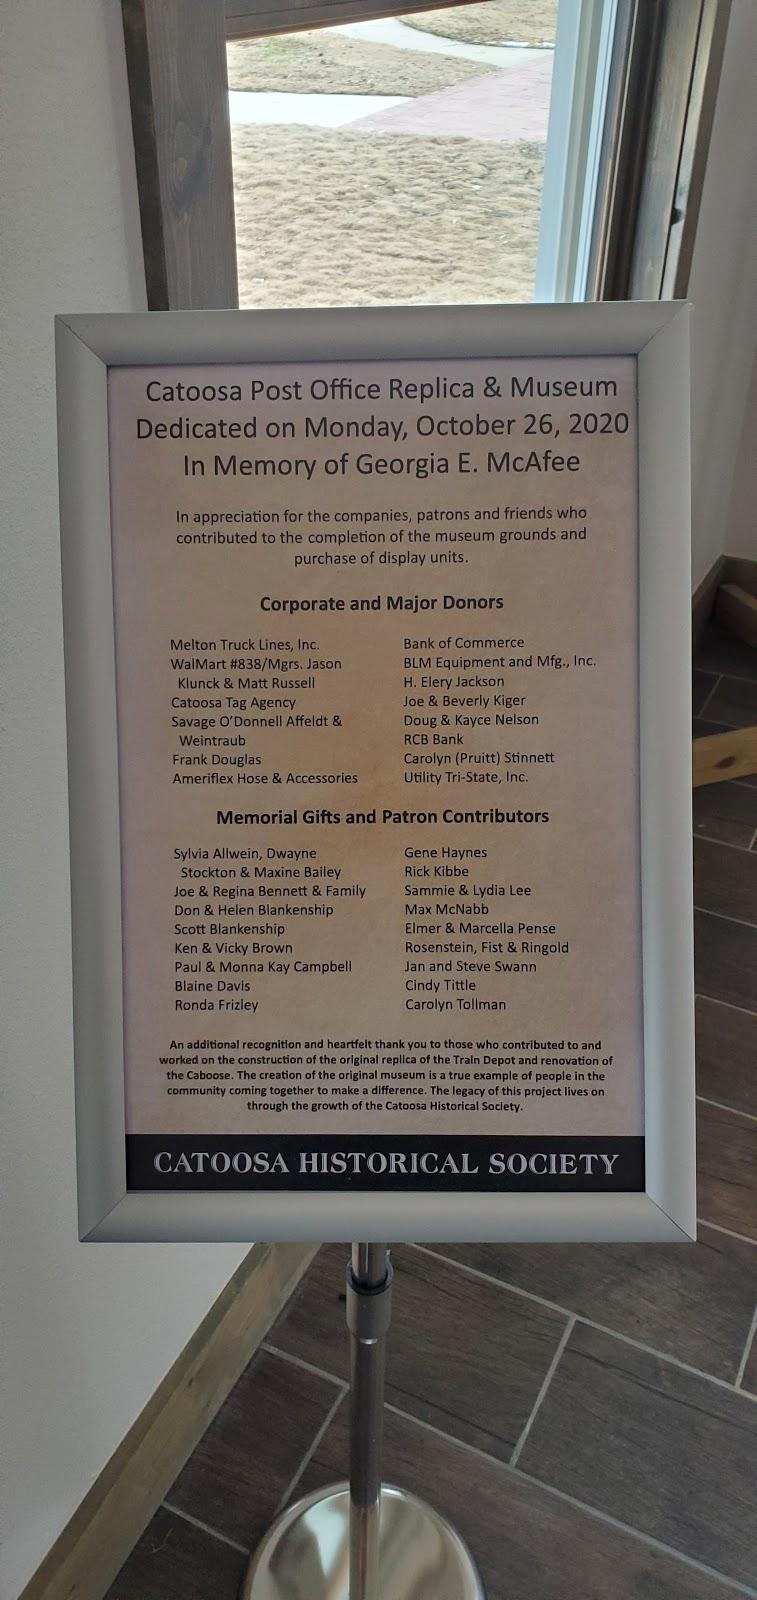 Catoosa Historical Museum - museum  | Photo 3 of 10 | Address: 217 S Cherokee St #201, Catoosa, OK 74015, USA | Phone: (918) 266-3296